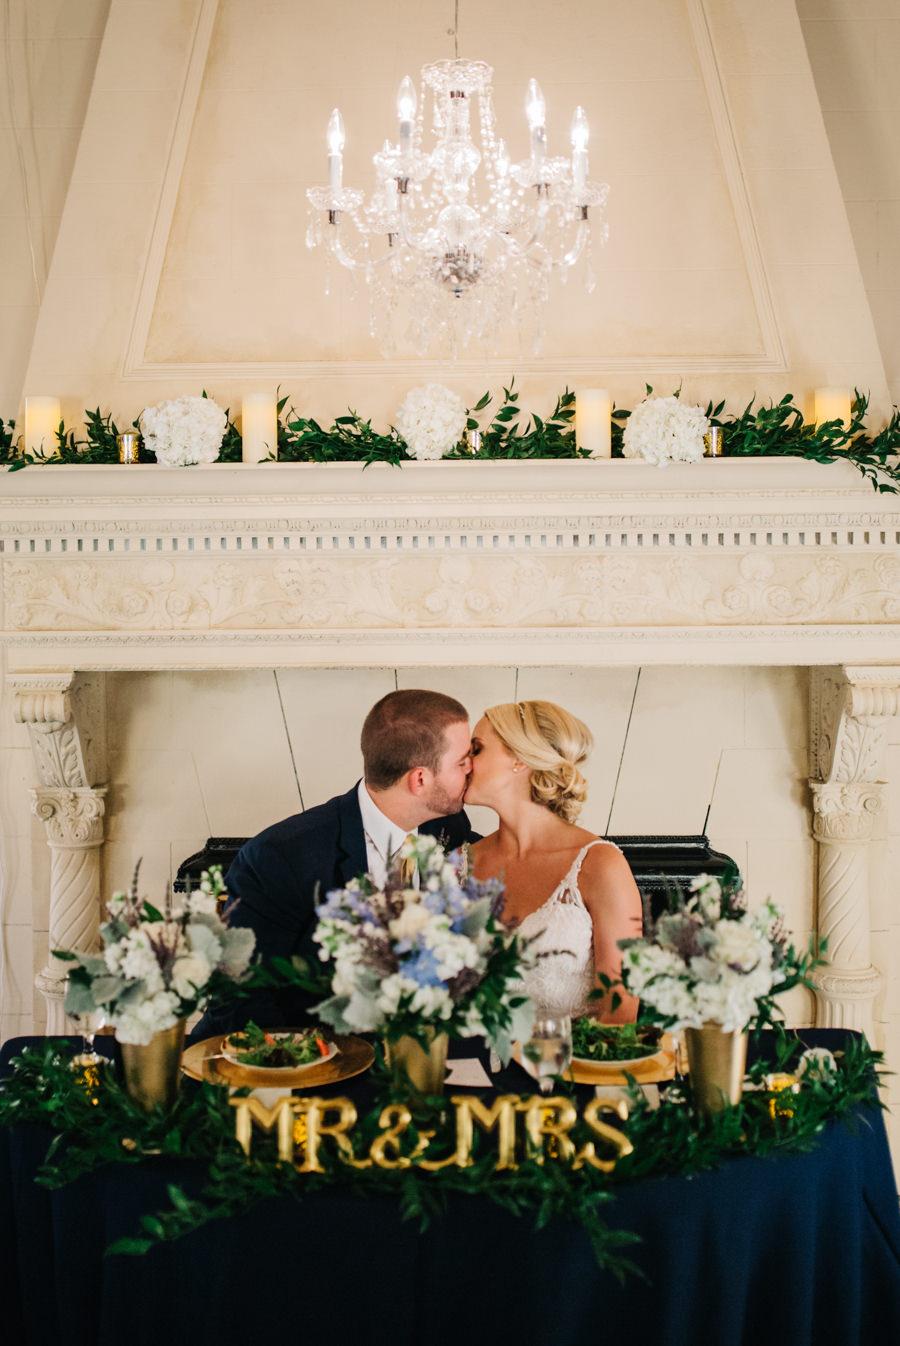 Sarasota Bride and Groom Portrait at Wedding Reception Sweetheart Table | Sarasota Wedding Florist Apple Blossoms Floral Designs | Wedding Planner Nicholle Leonard Designs